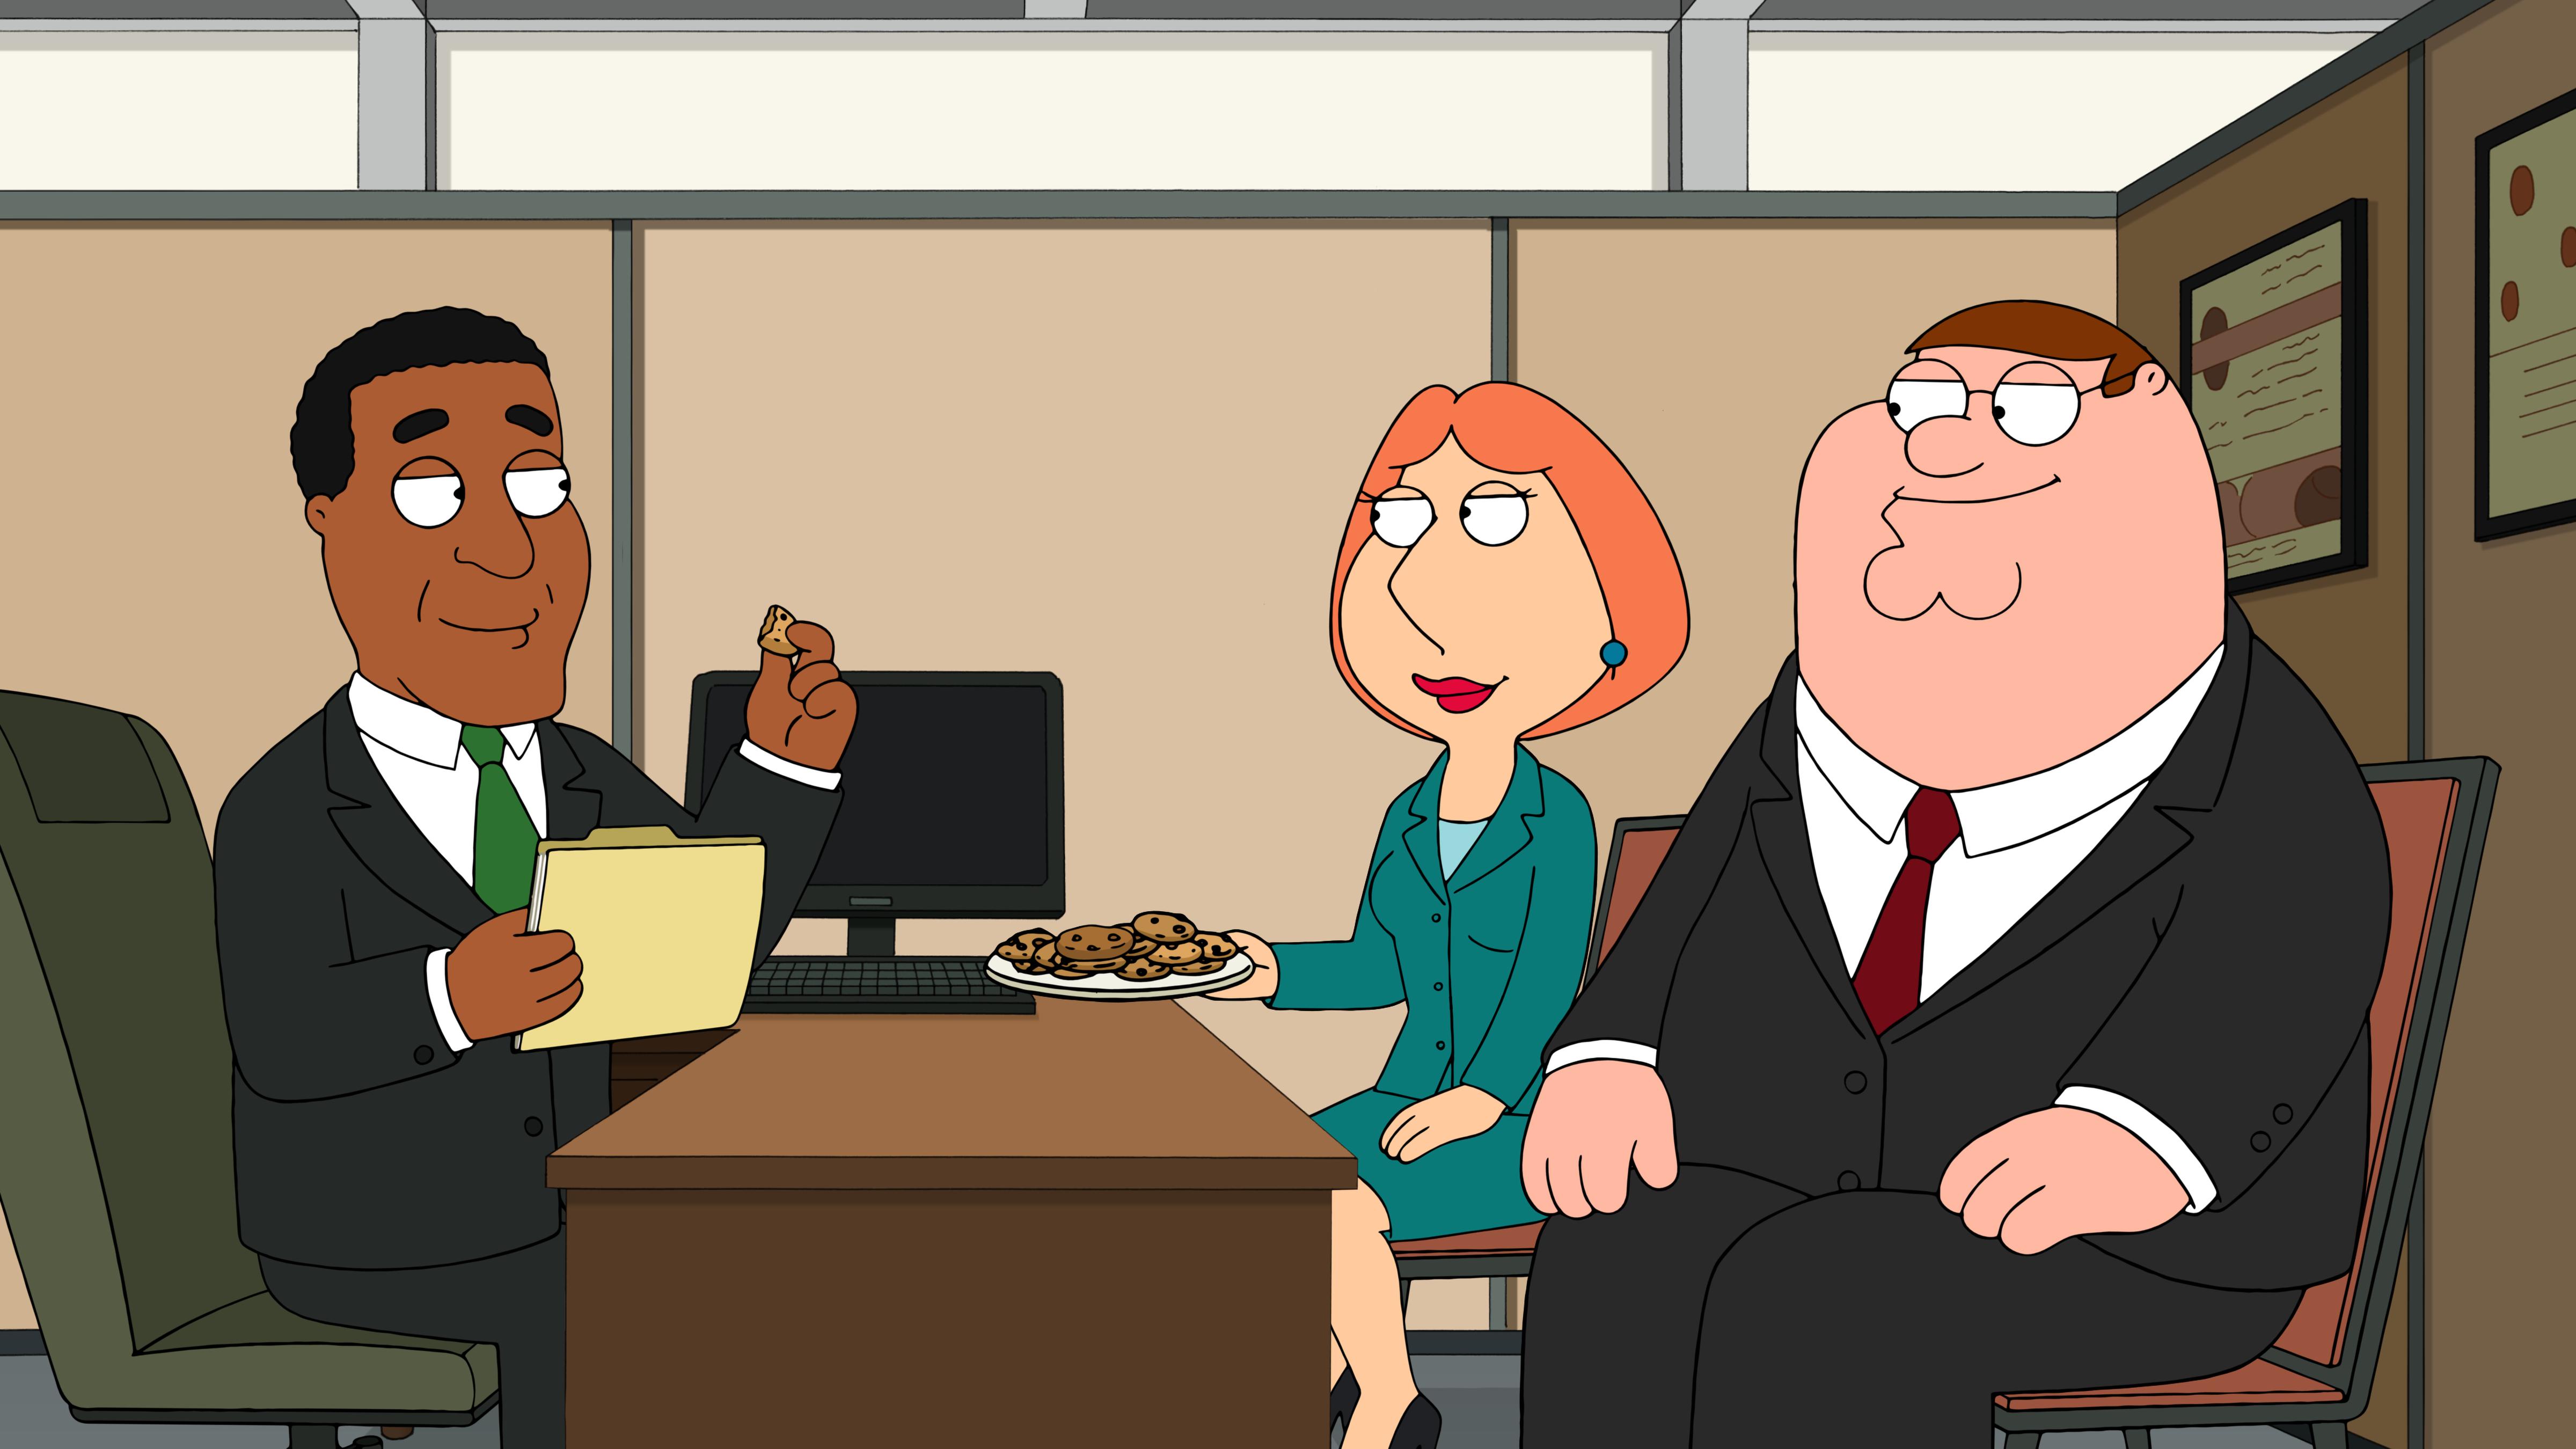 Baking Bad Family Guy Wiki